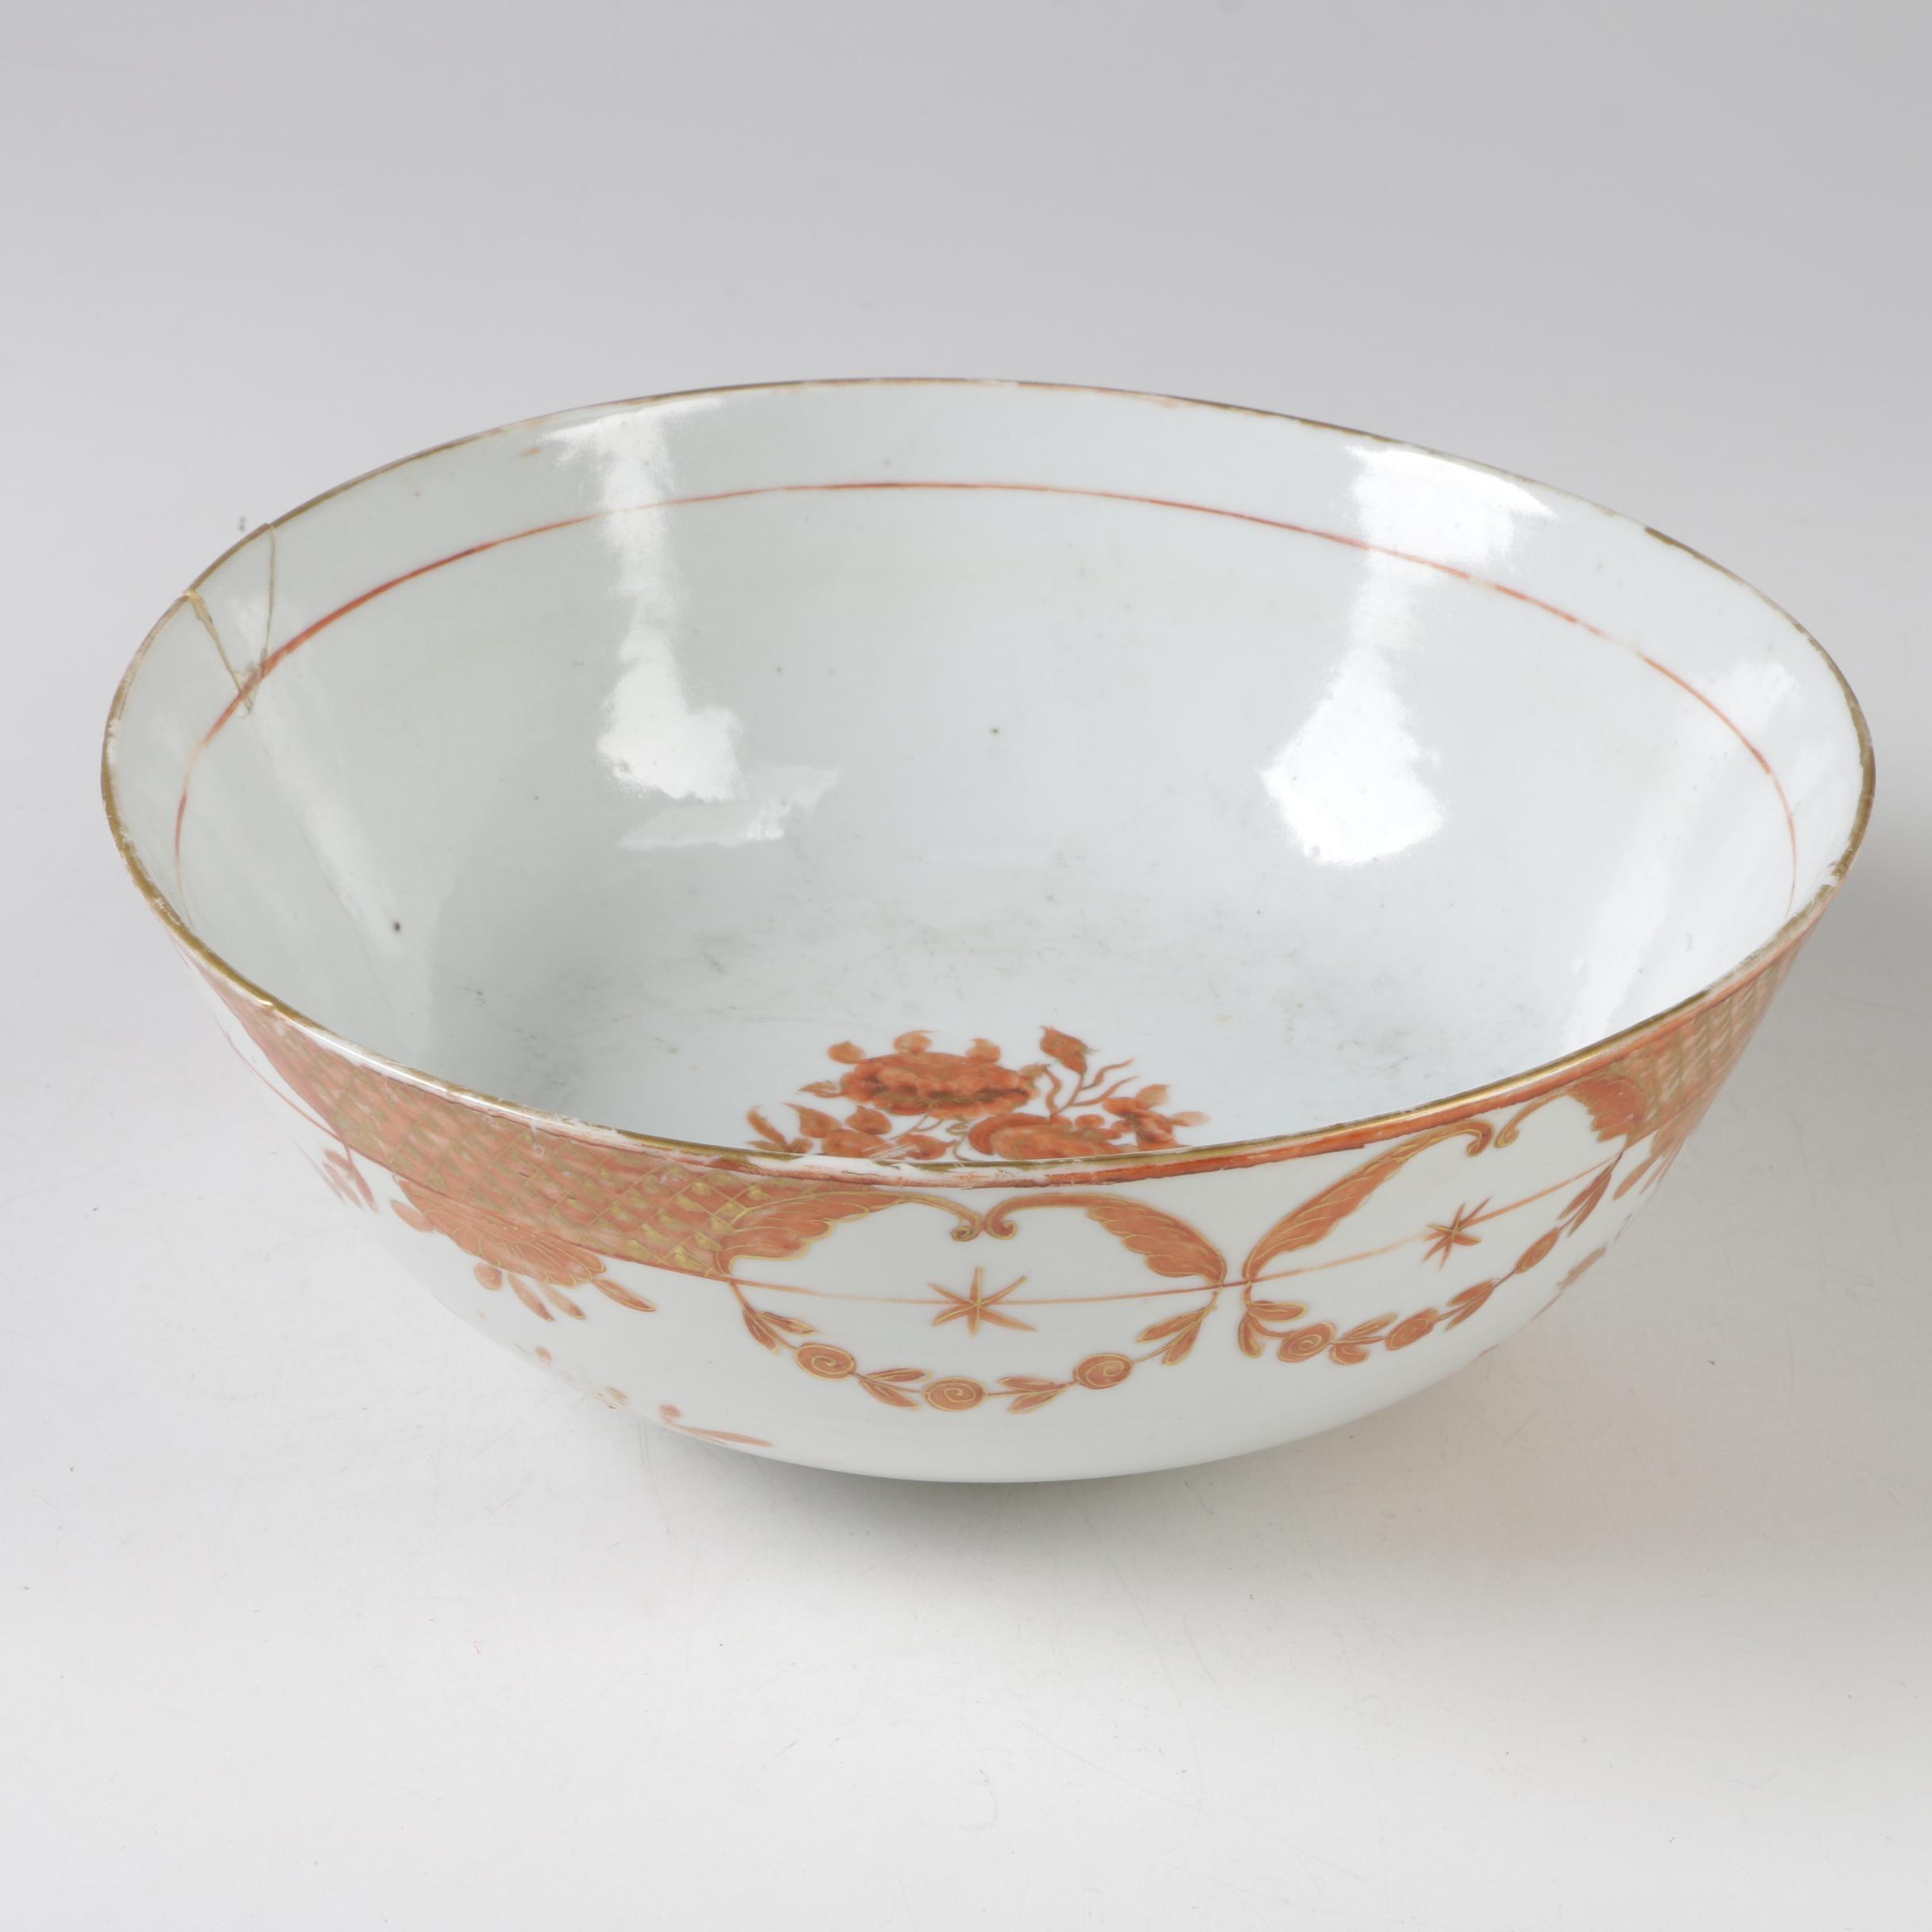 Chinese Export Orange Fitzhugh Hand-Painted Porcelain Bowl, Antique